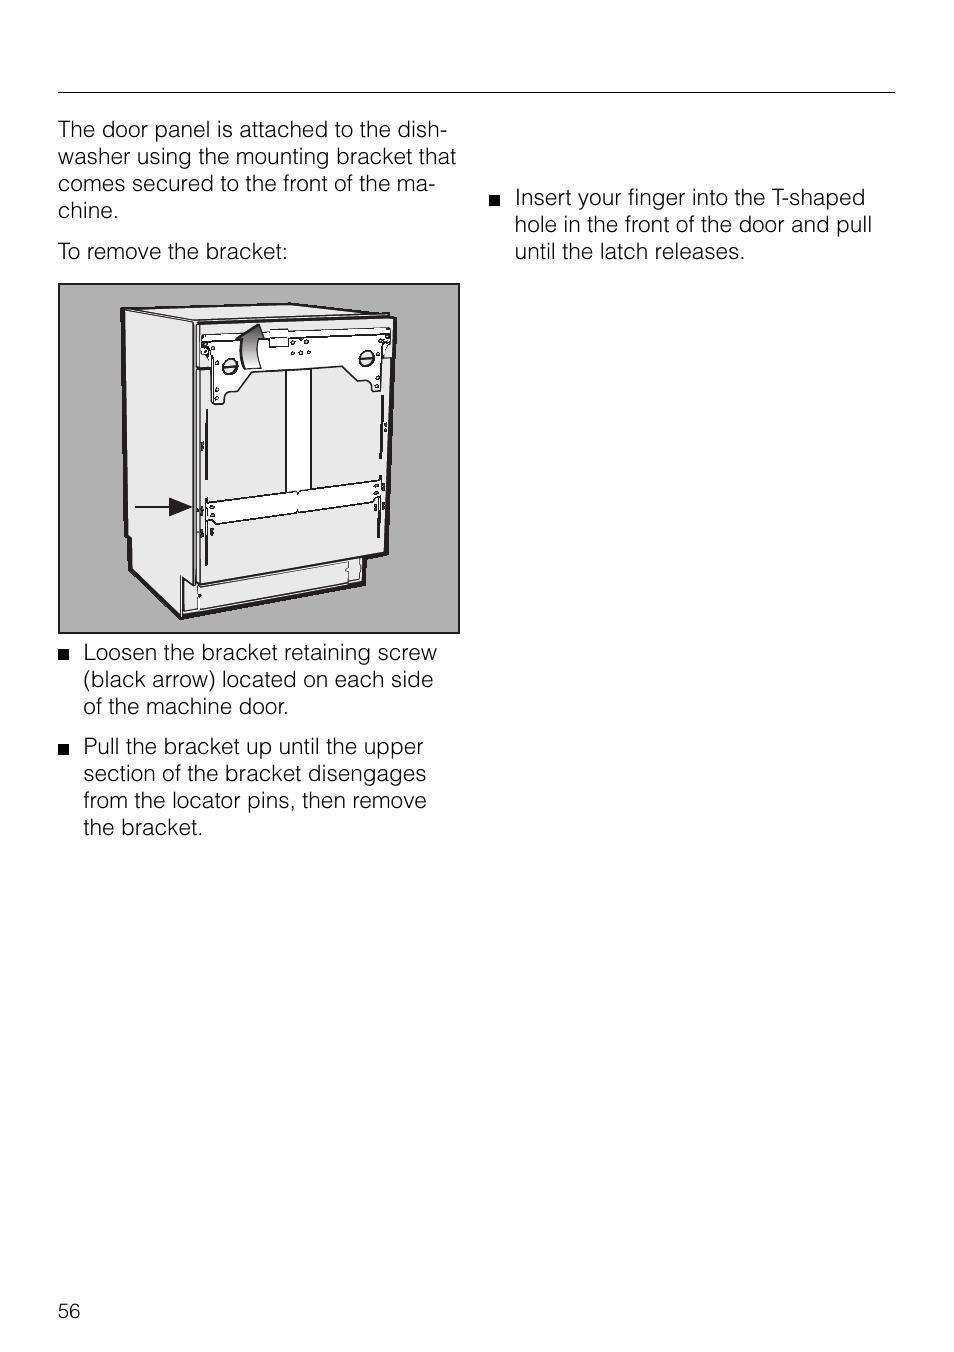 dishwasher installation miele g 879 scvi user manual page 56 rh manualsdir com Miele Dishwasher Model Number La Perla Miele Dishwasher Model Number La Perla